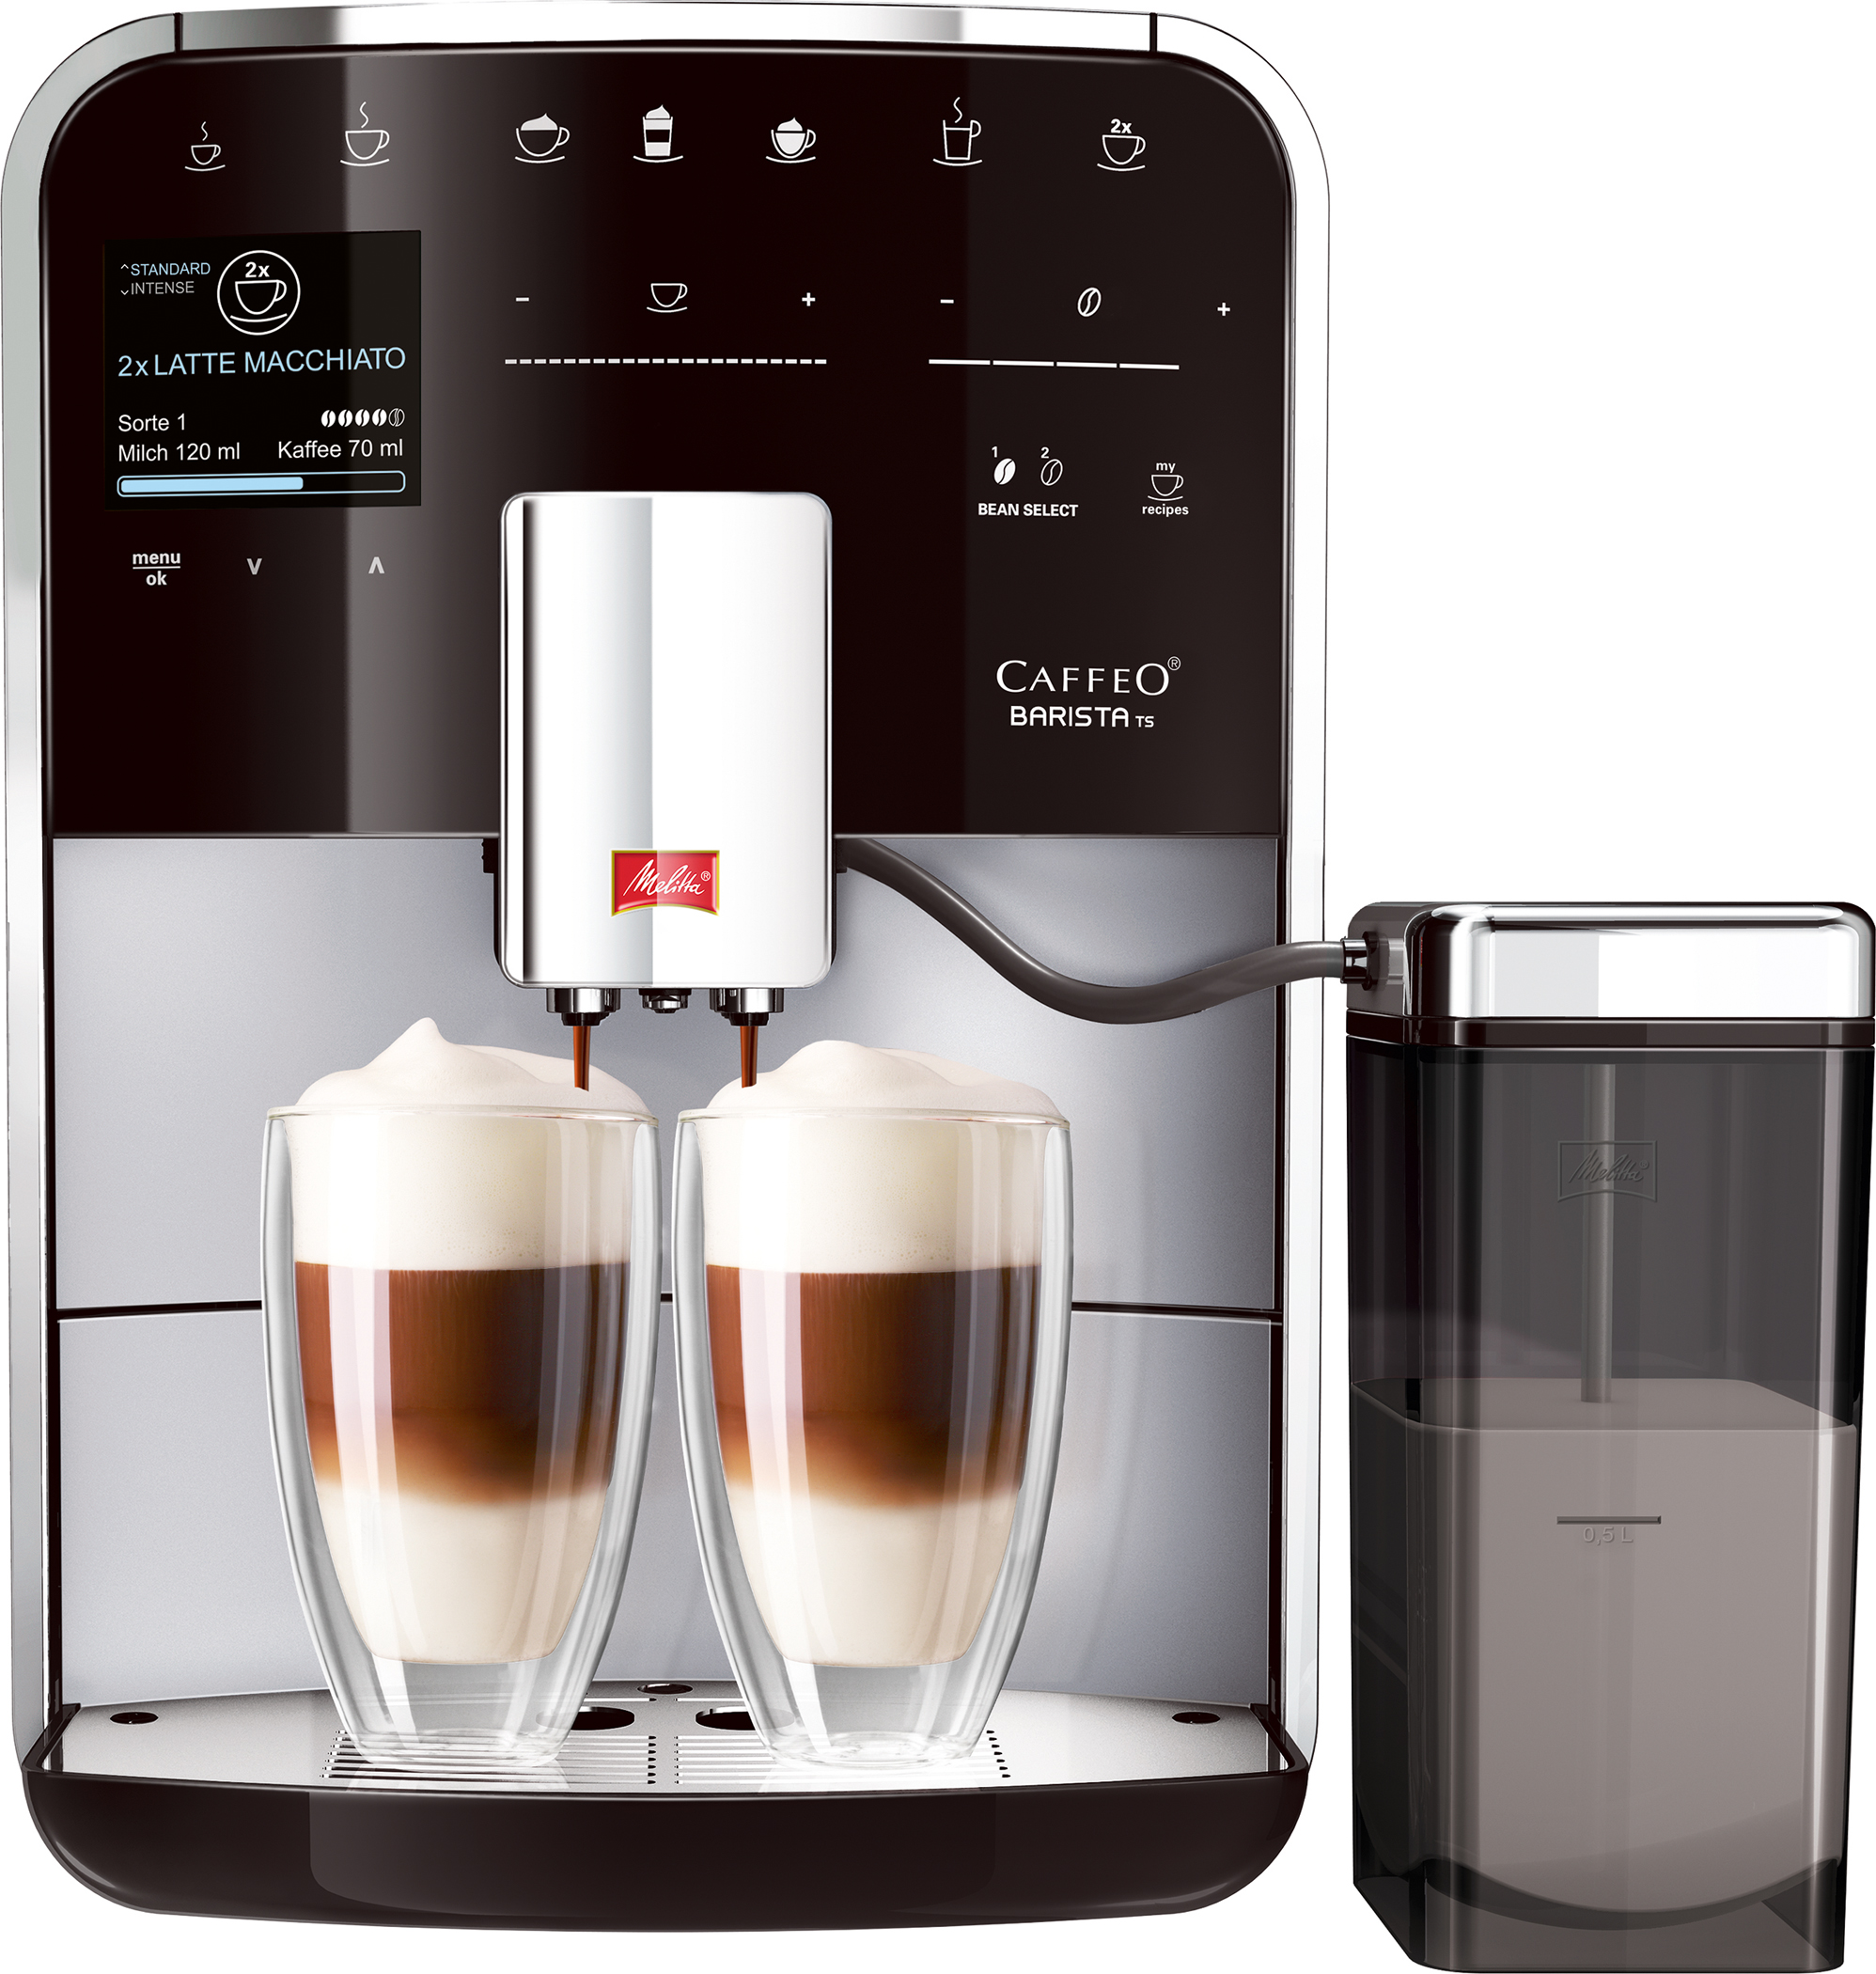 melitta kaffeevollautomat caffeo barista. Black Bedroom Furniture Sets. Home Design Ideas